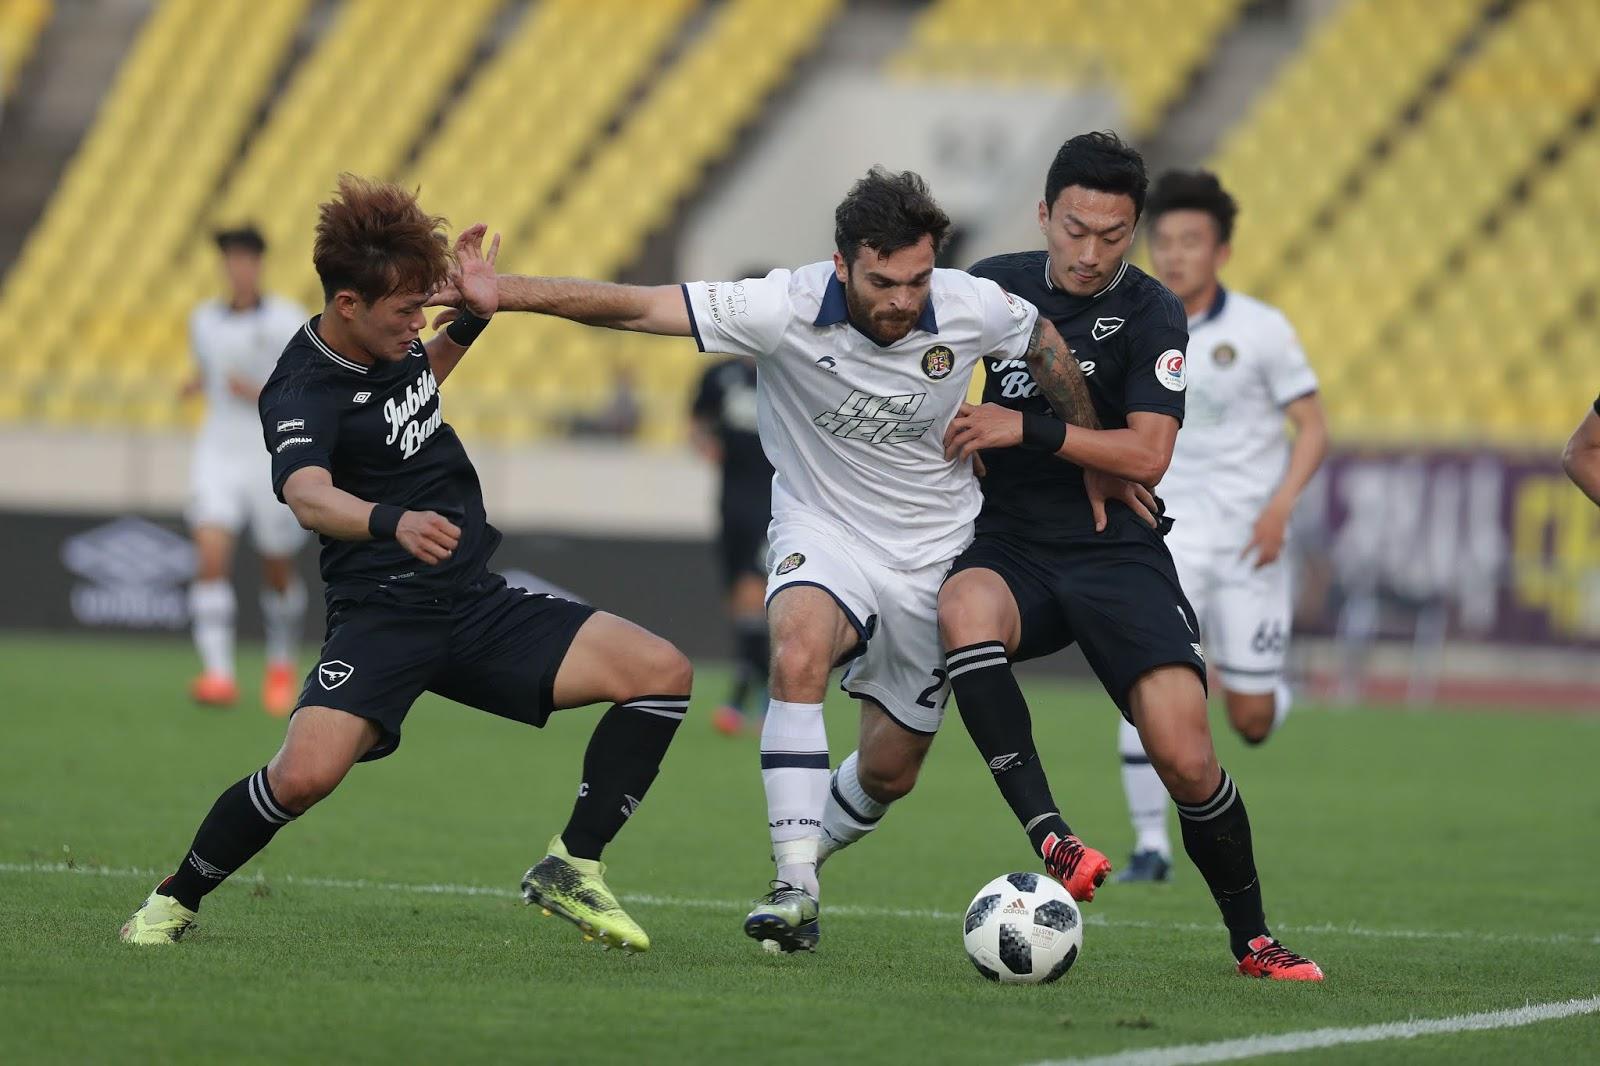 Preview: Seongnam FC vs Daejeon Citizen K League 2